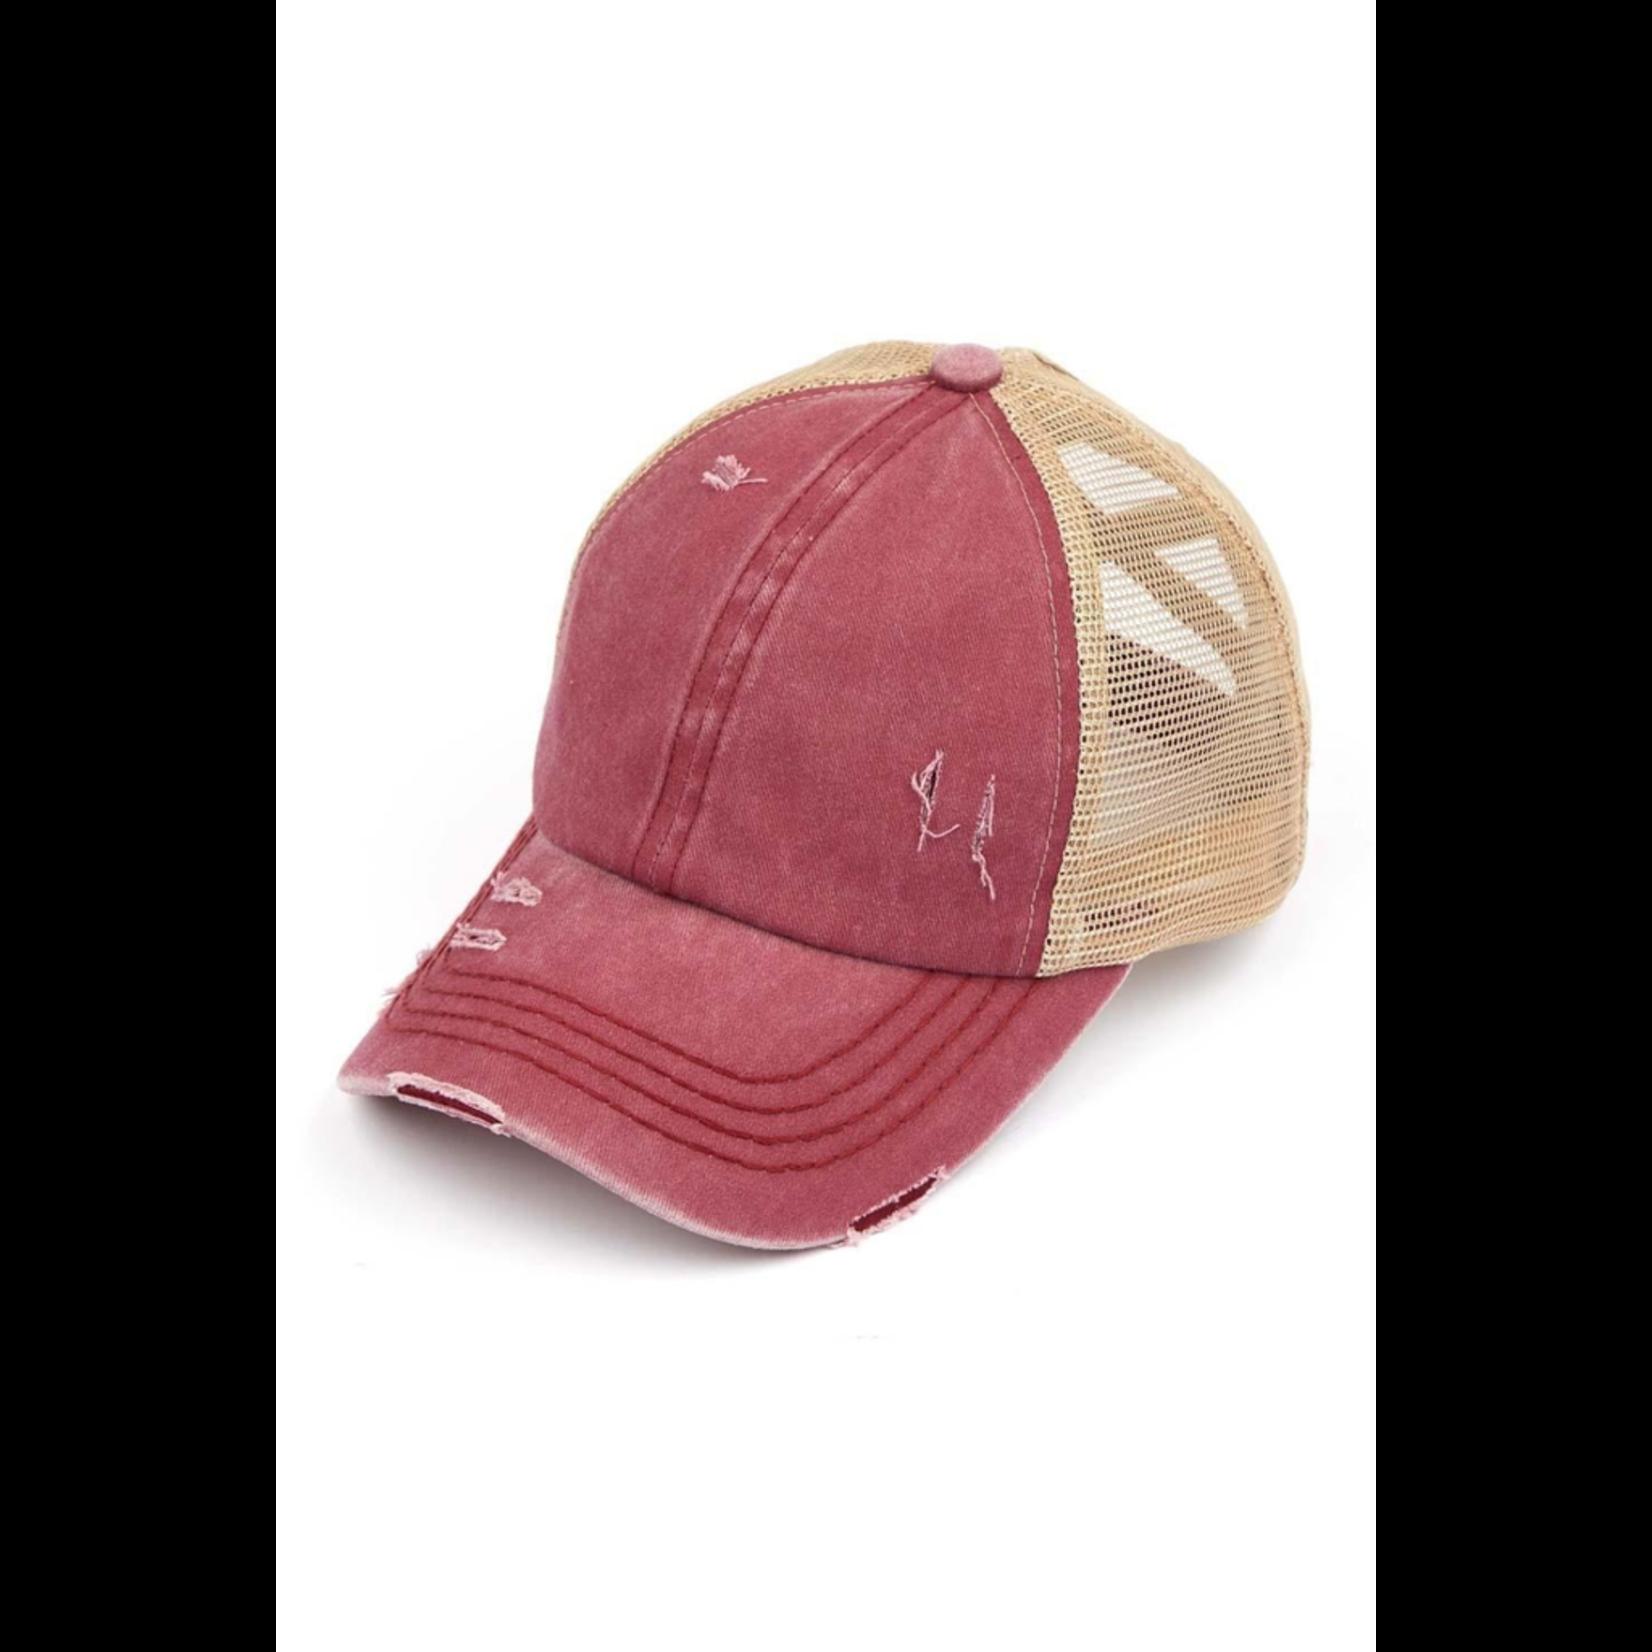 CC Distressed Ponytail hat